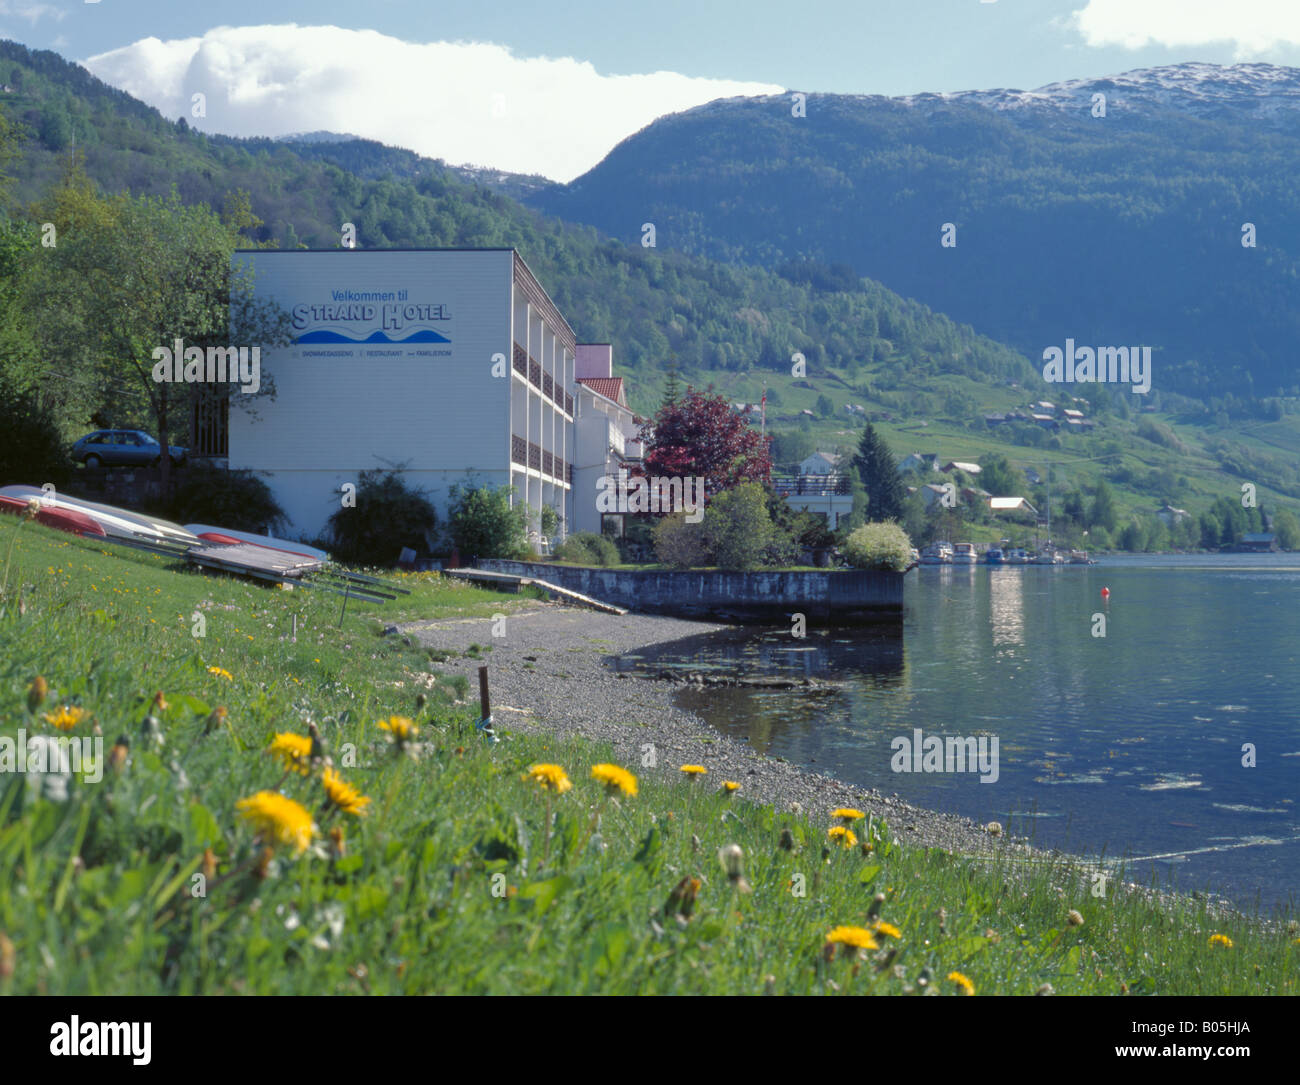 ulvik rica strand fjord hotel